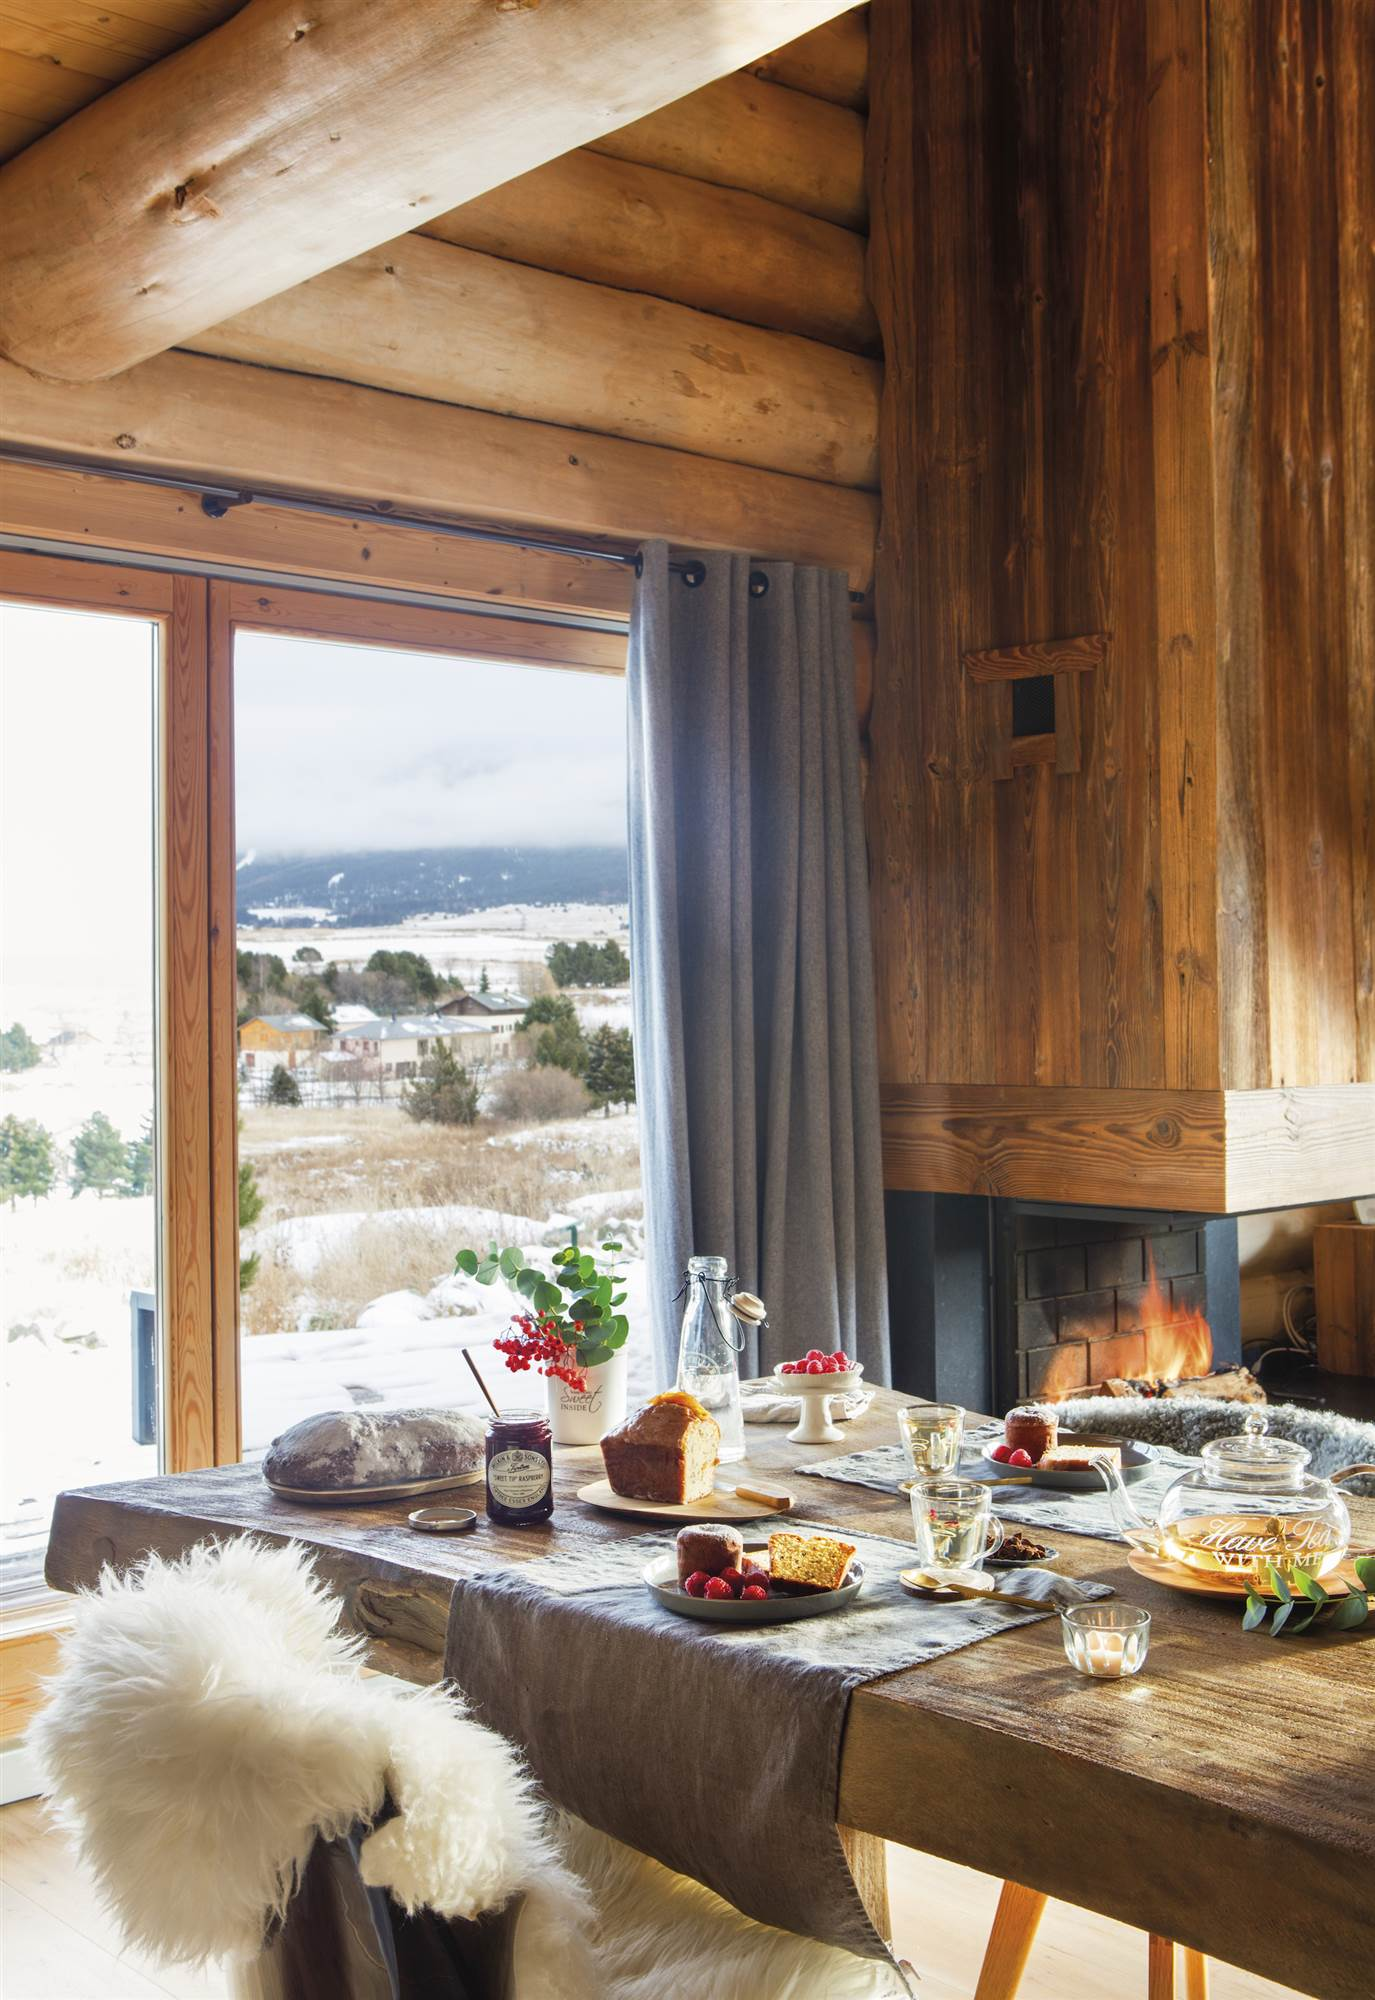 Casas r sticas de madera - Comedor con chimenea ...